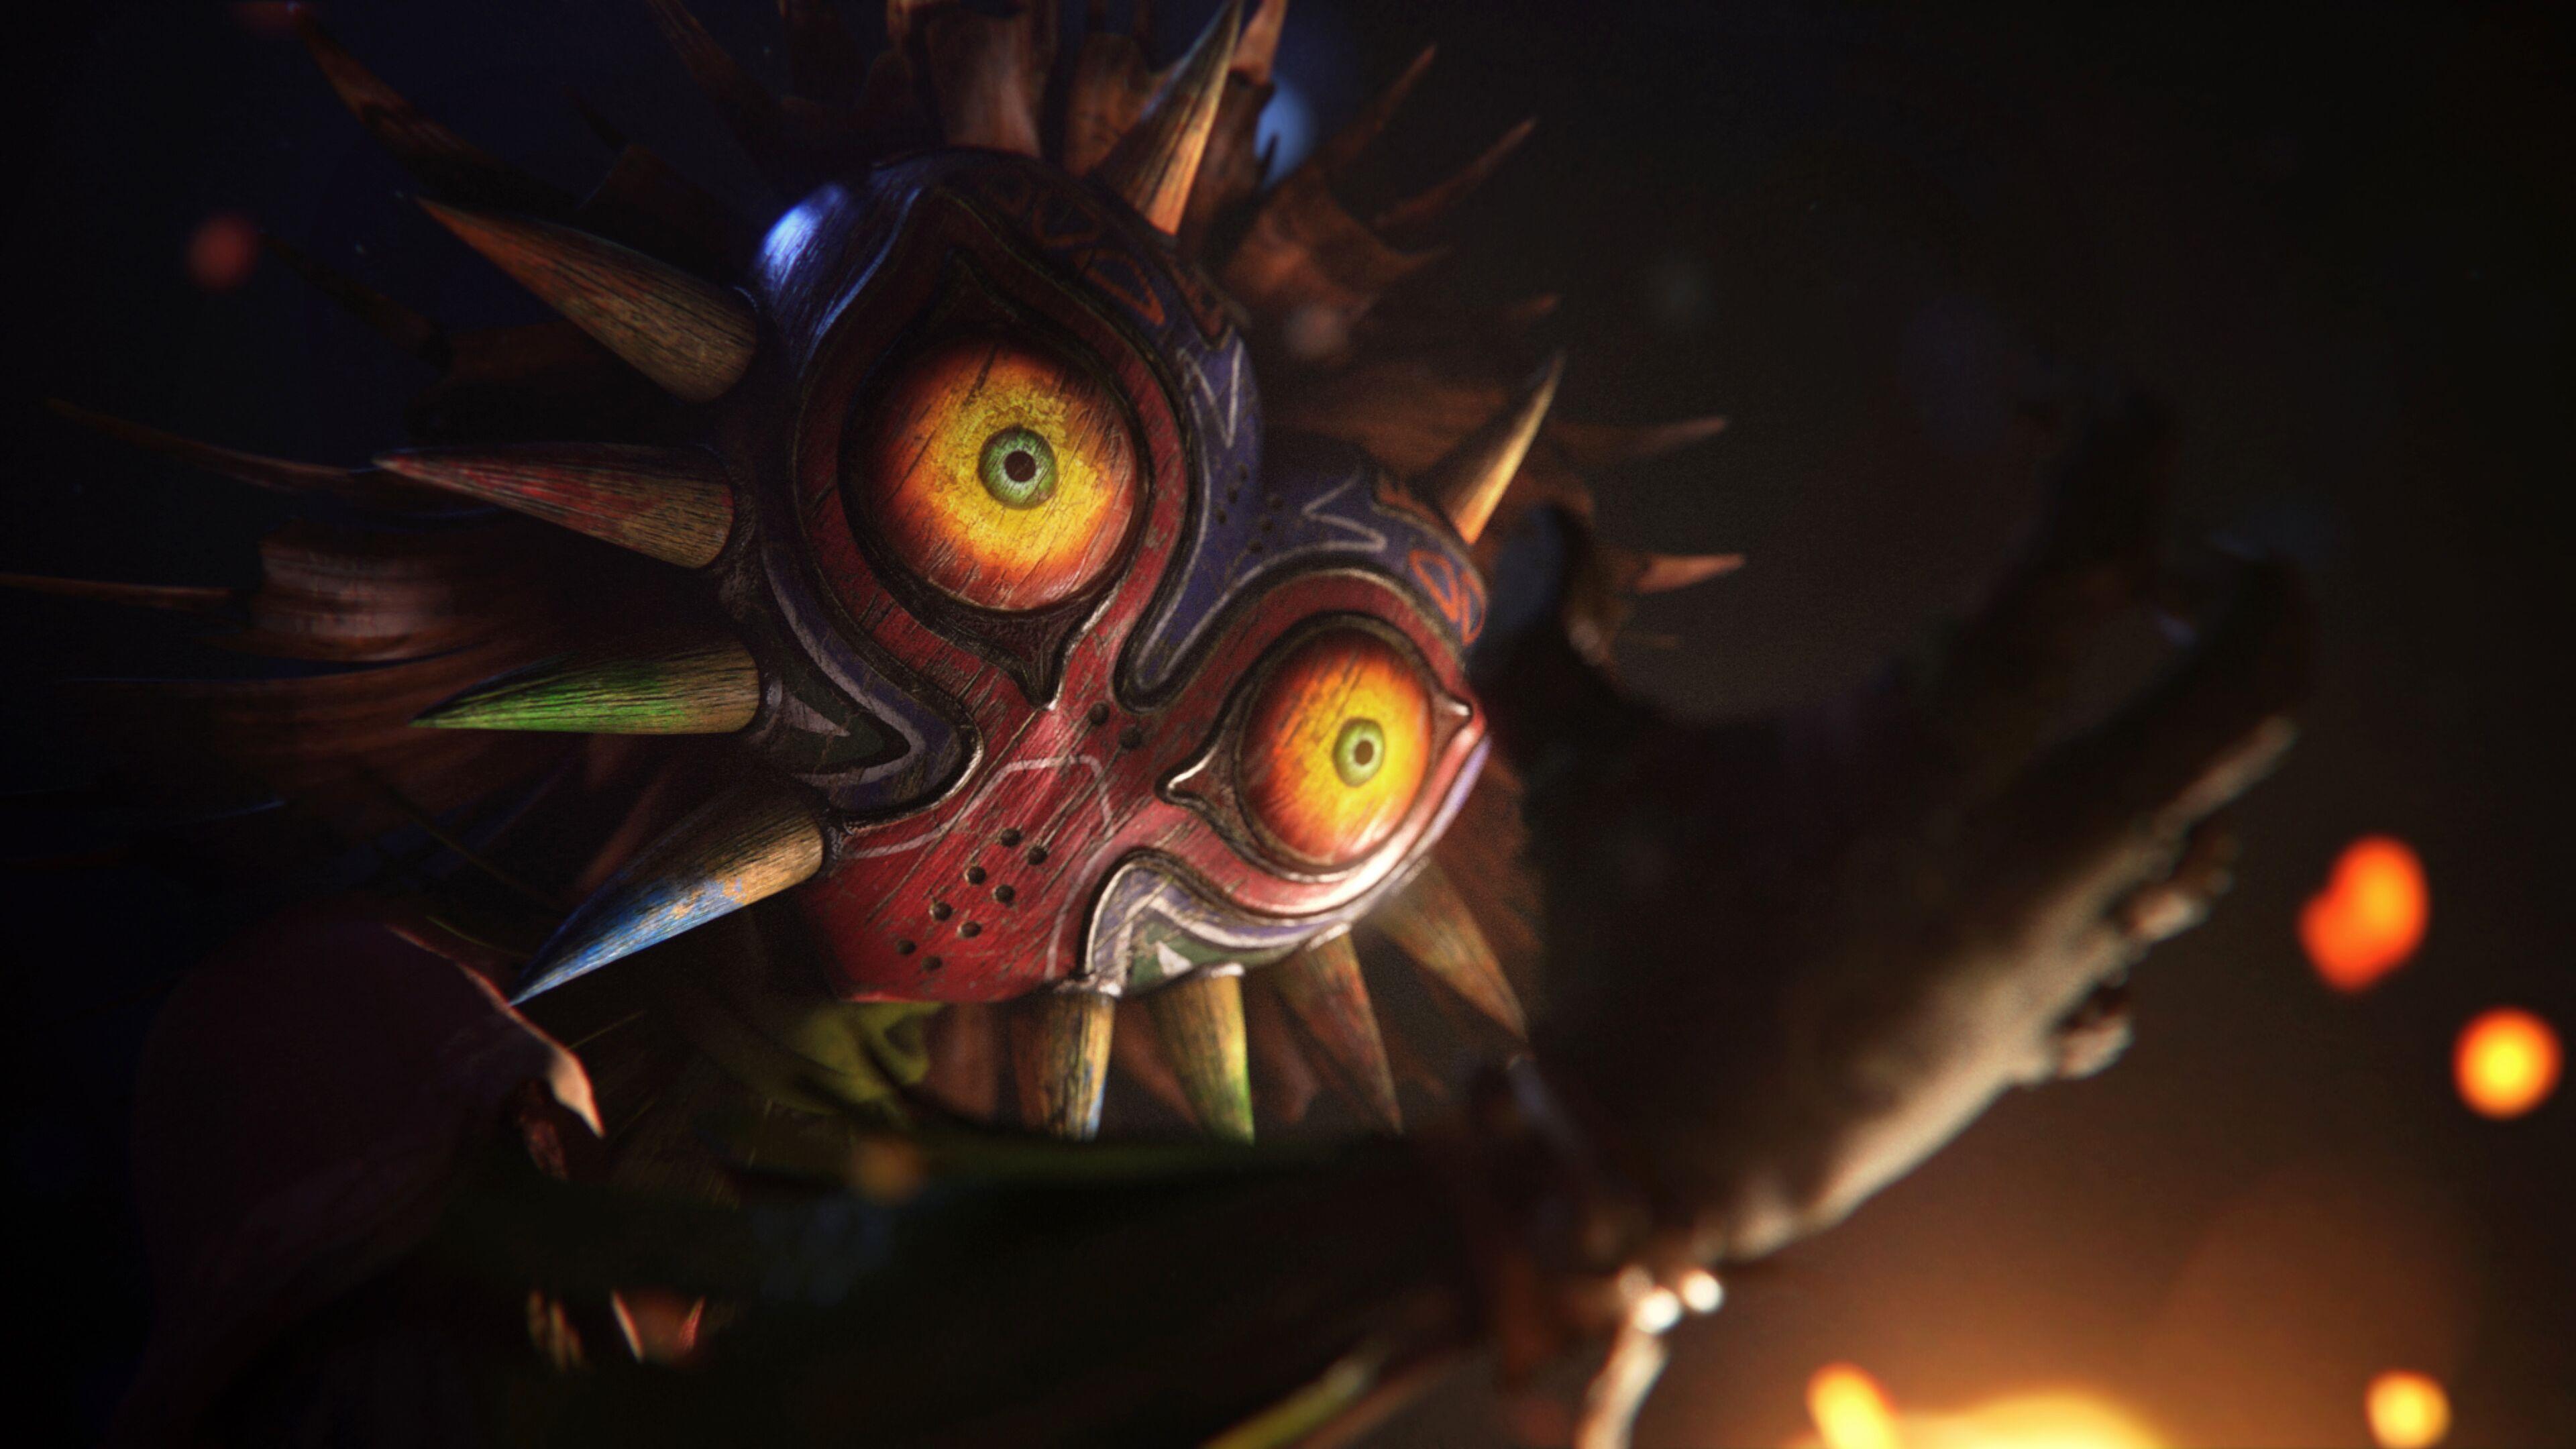 Skull Kid Wallpaper: Wallpaper : The Legend Of Zelda Majora's Mask, Skull Kid